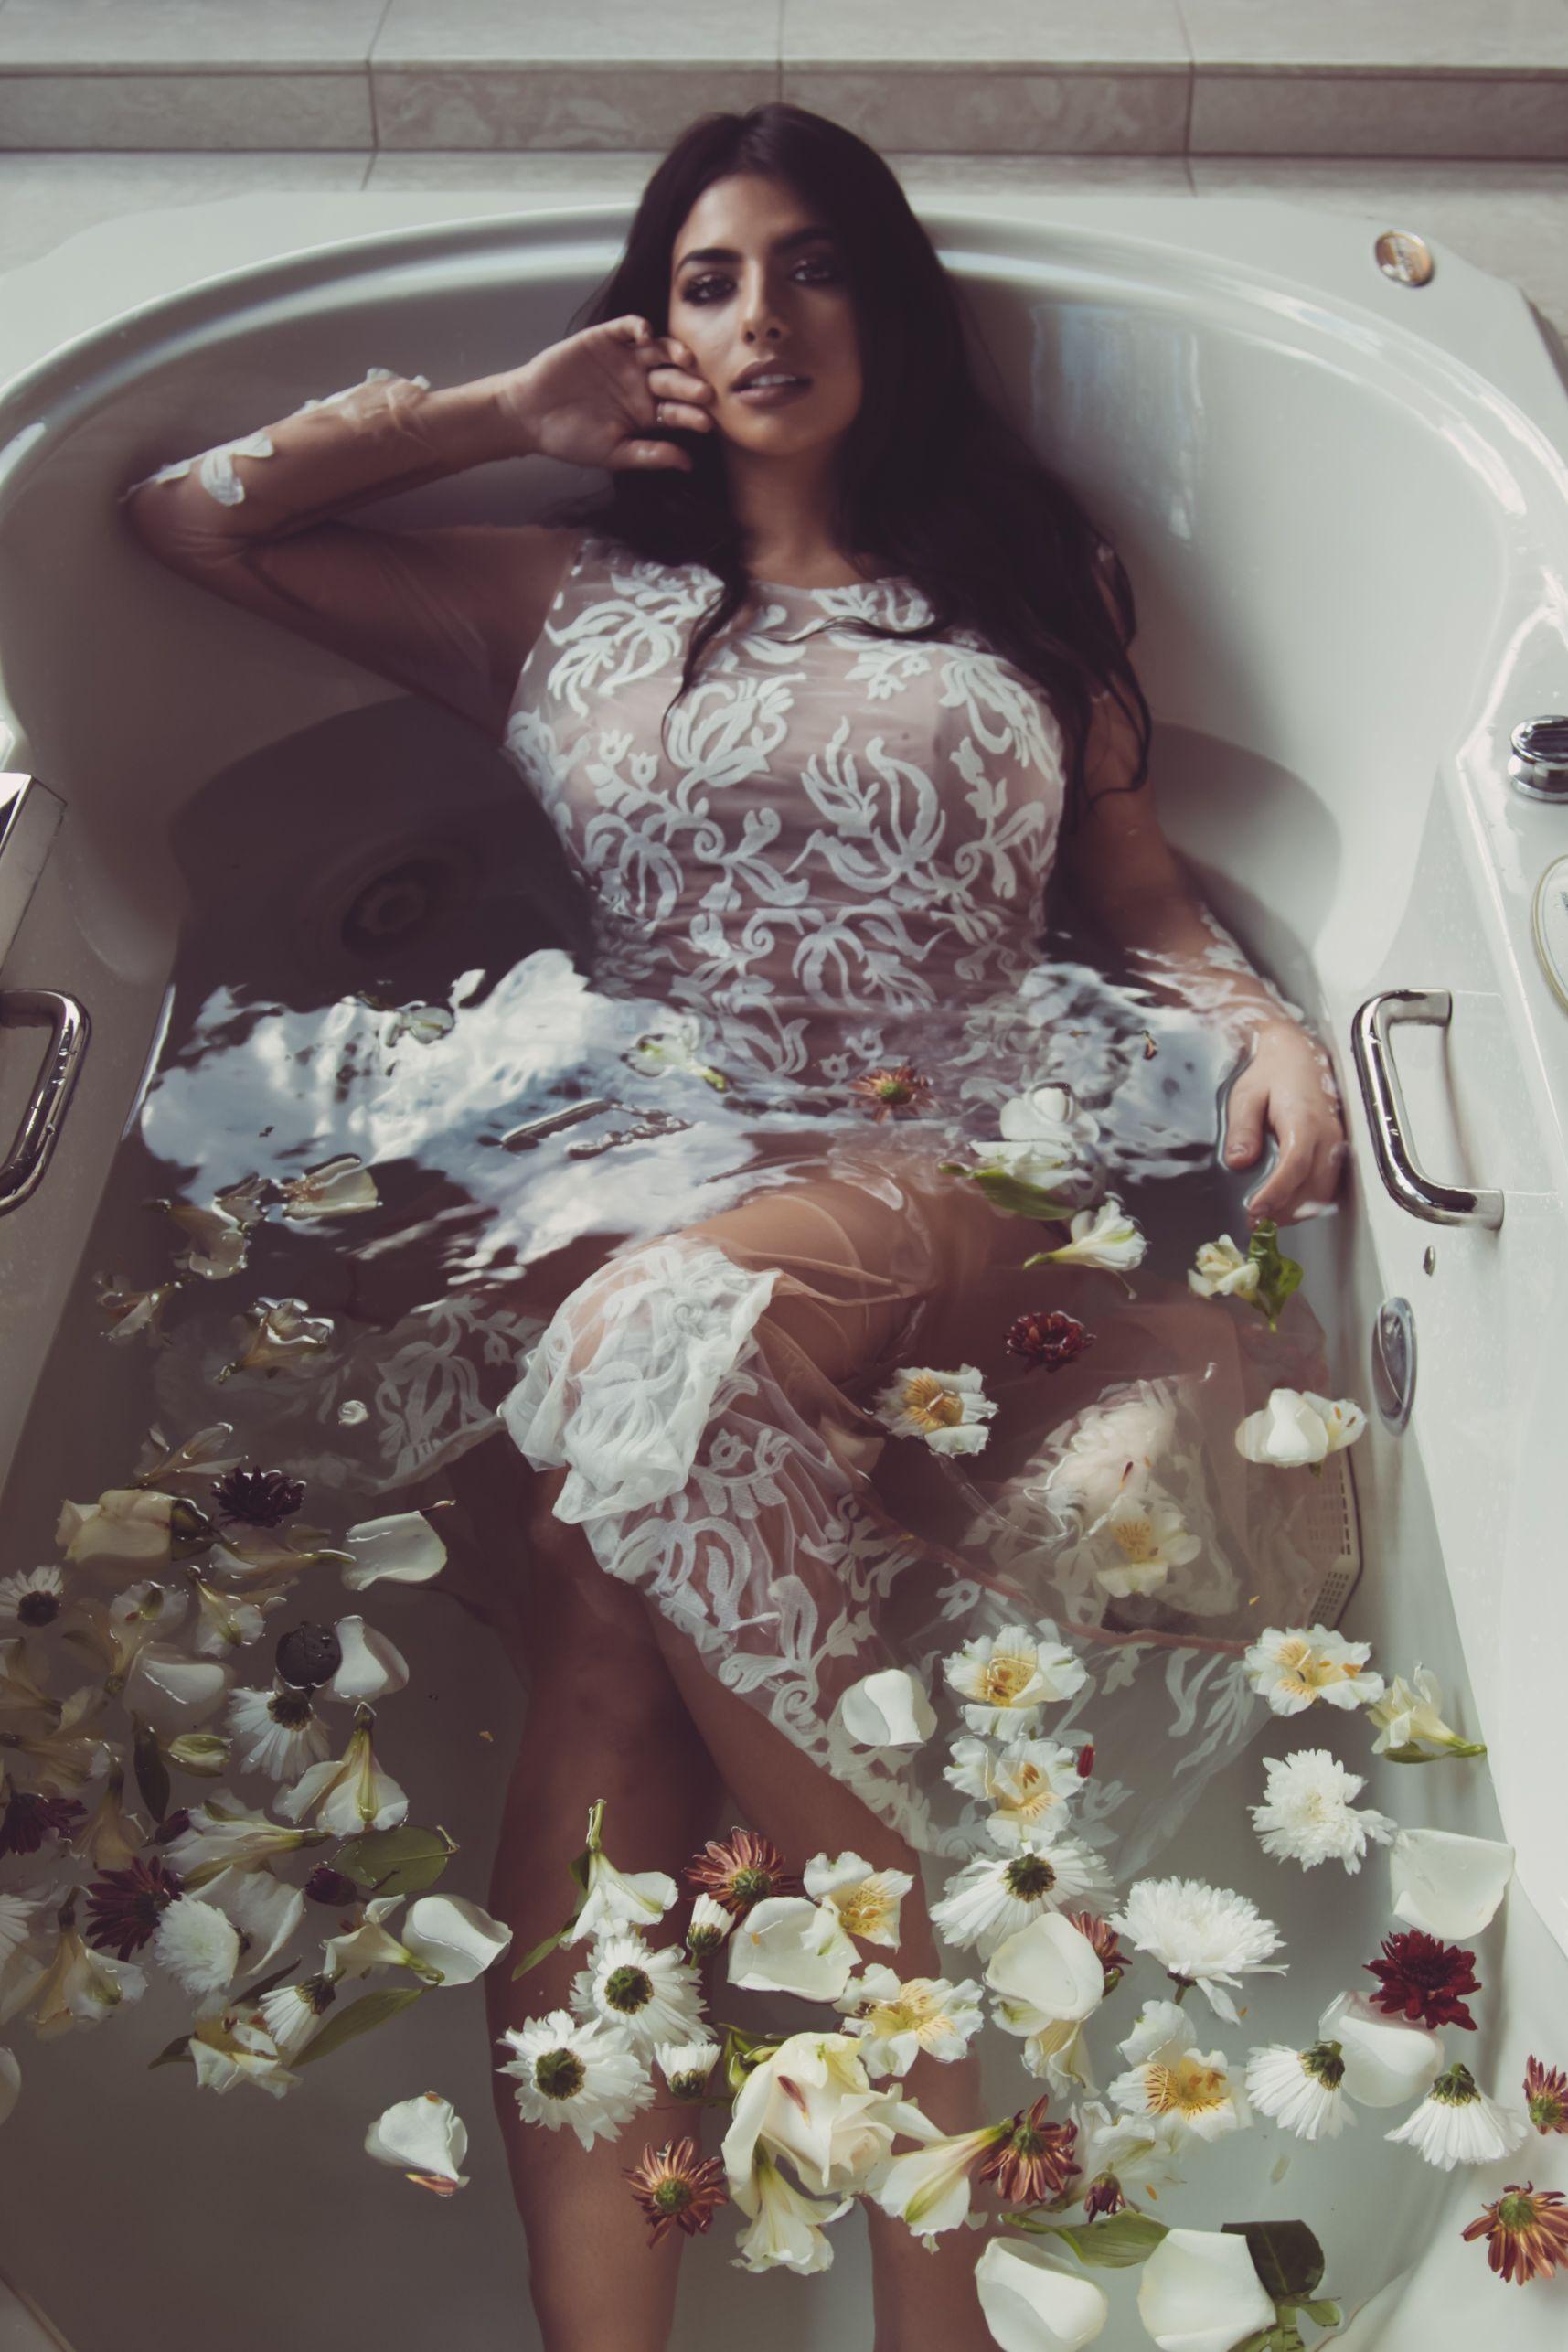 Bathtub Photoshoot Ideas Milk Bath